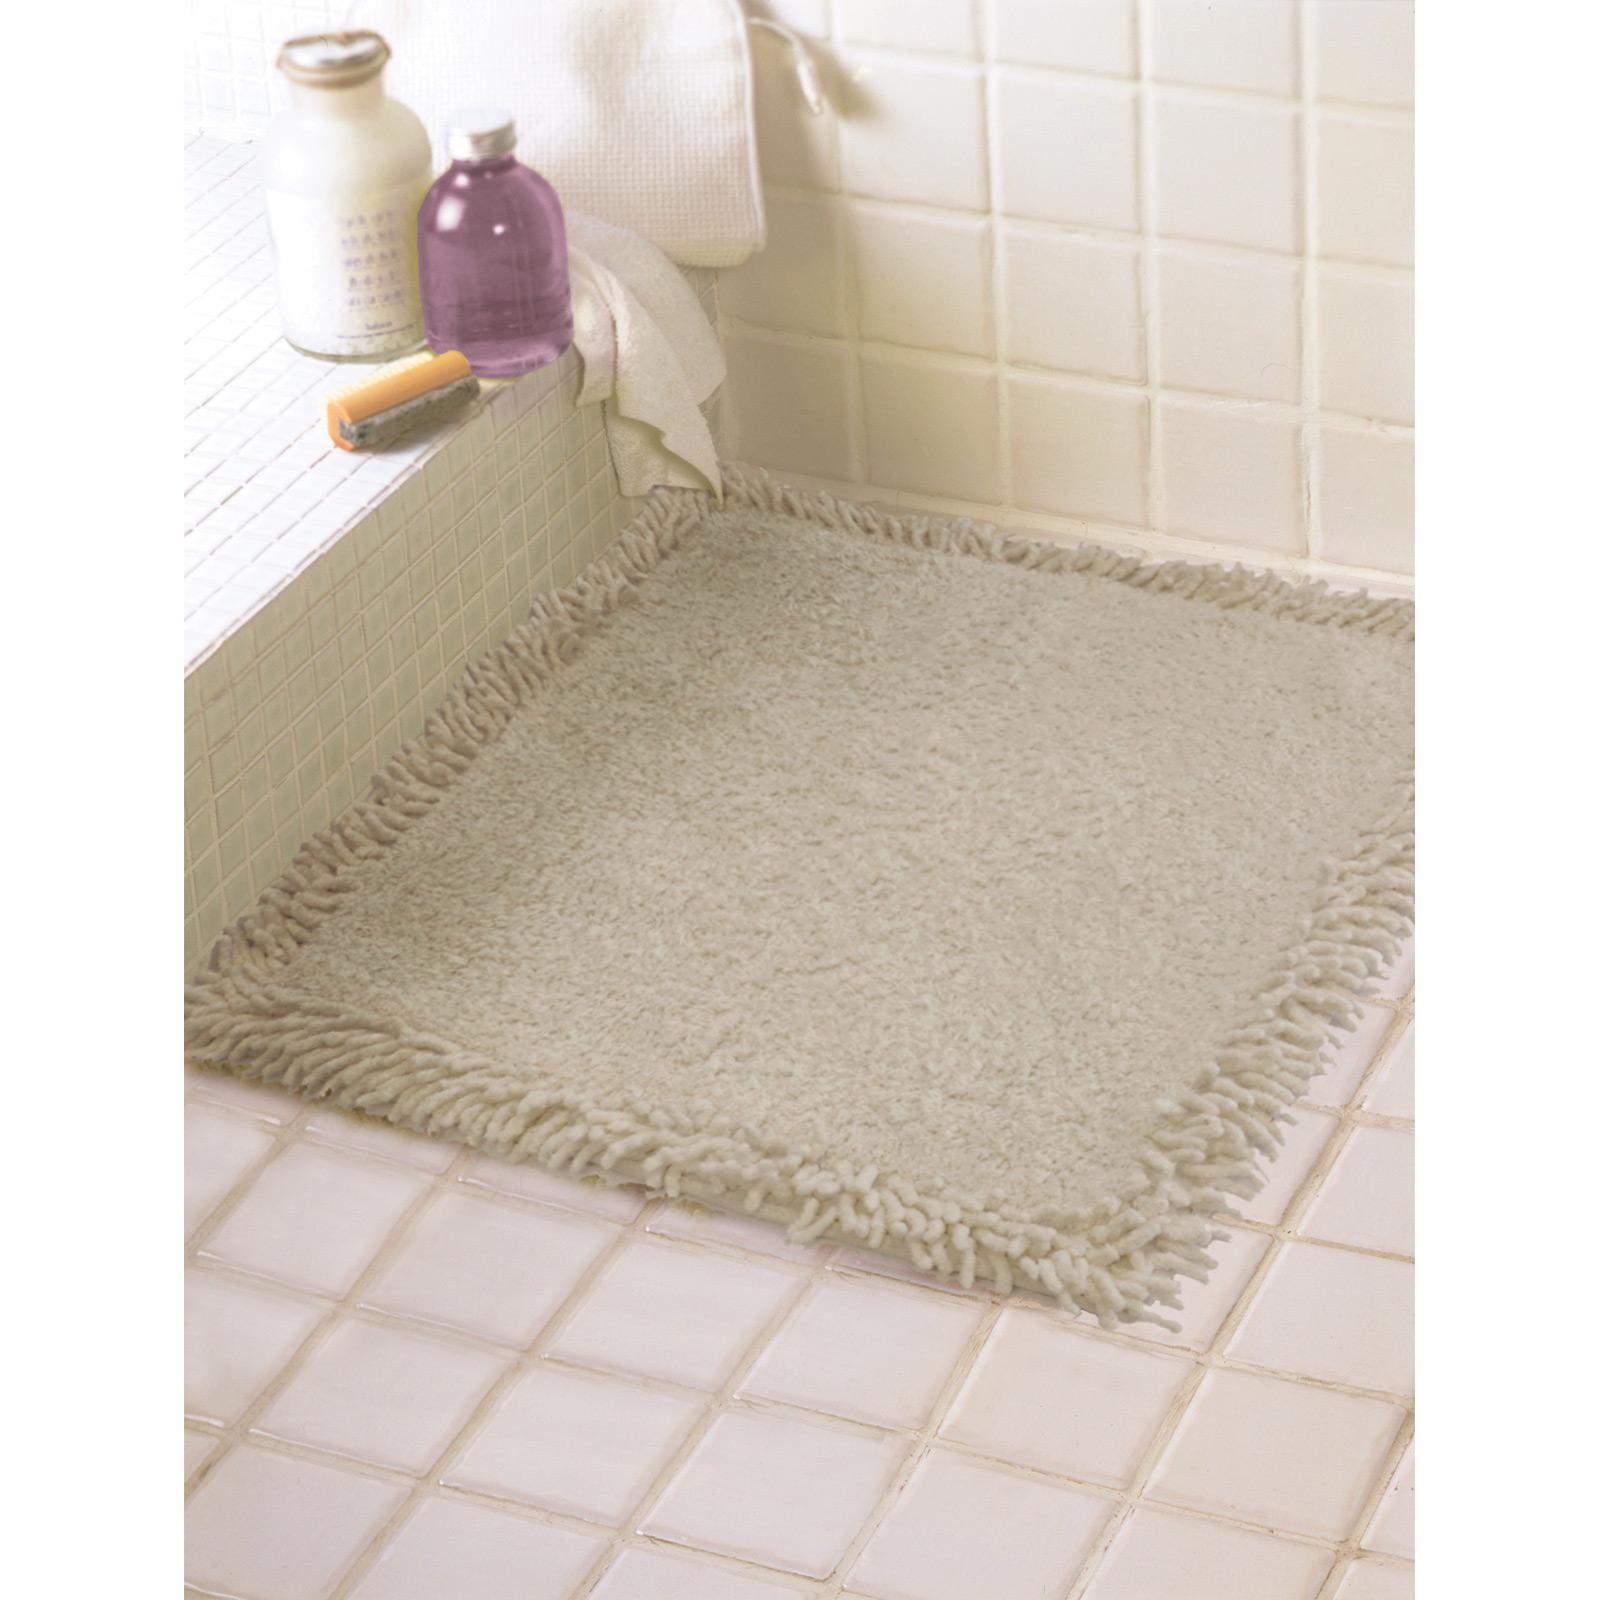 60cm x 60cm shower mat floor towel bath rug 100 cotton for 100 floors floor 60